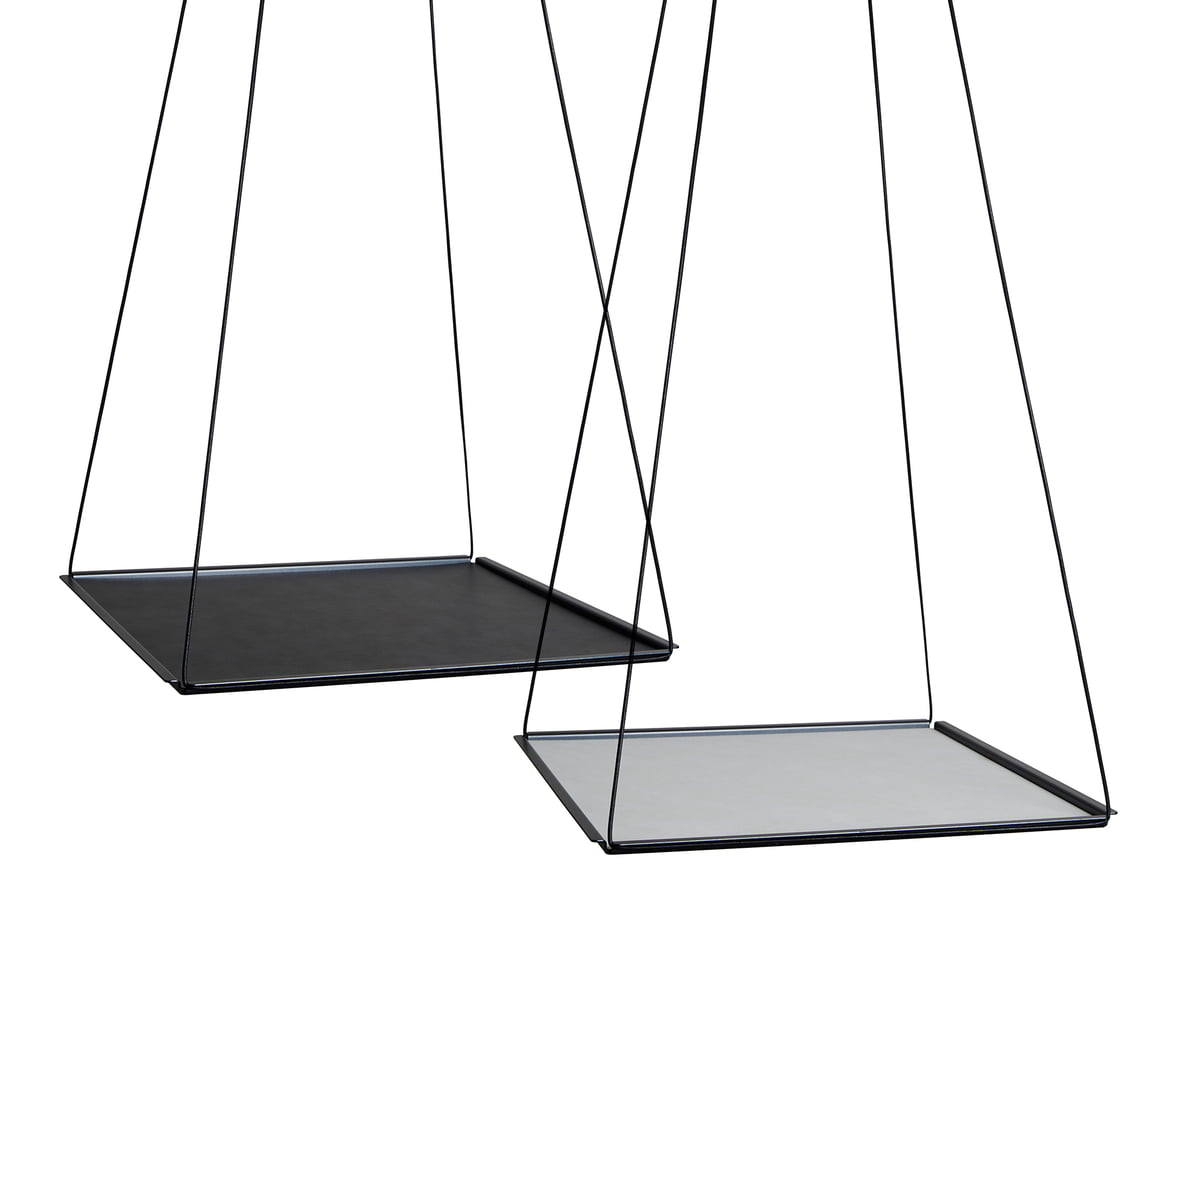 Linddna pendulum square l 36x36 cm stahl schwarz double cloud schwarz nupo metallic frei